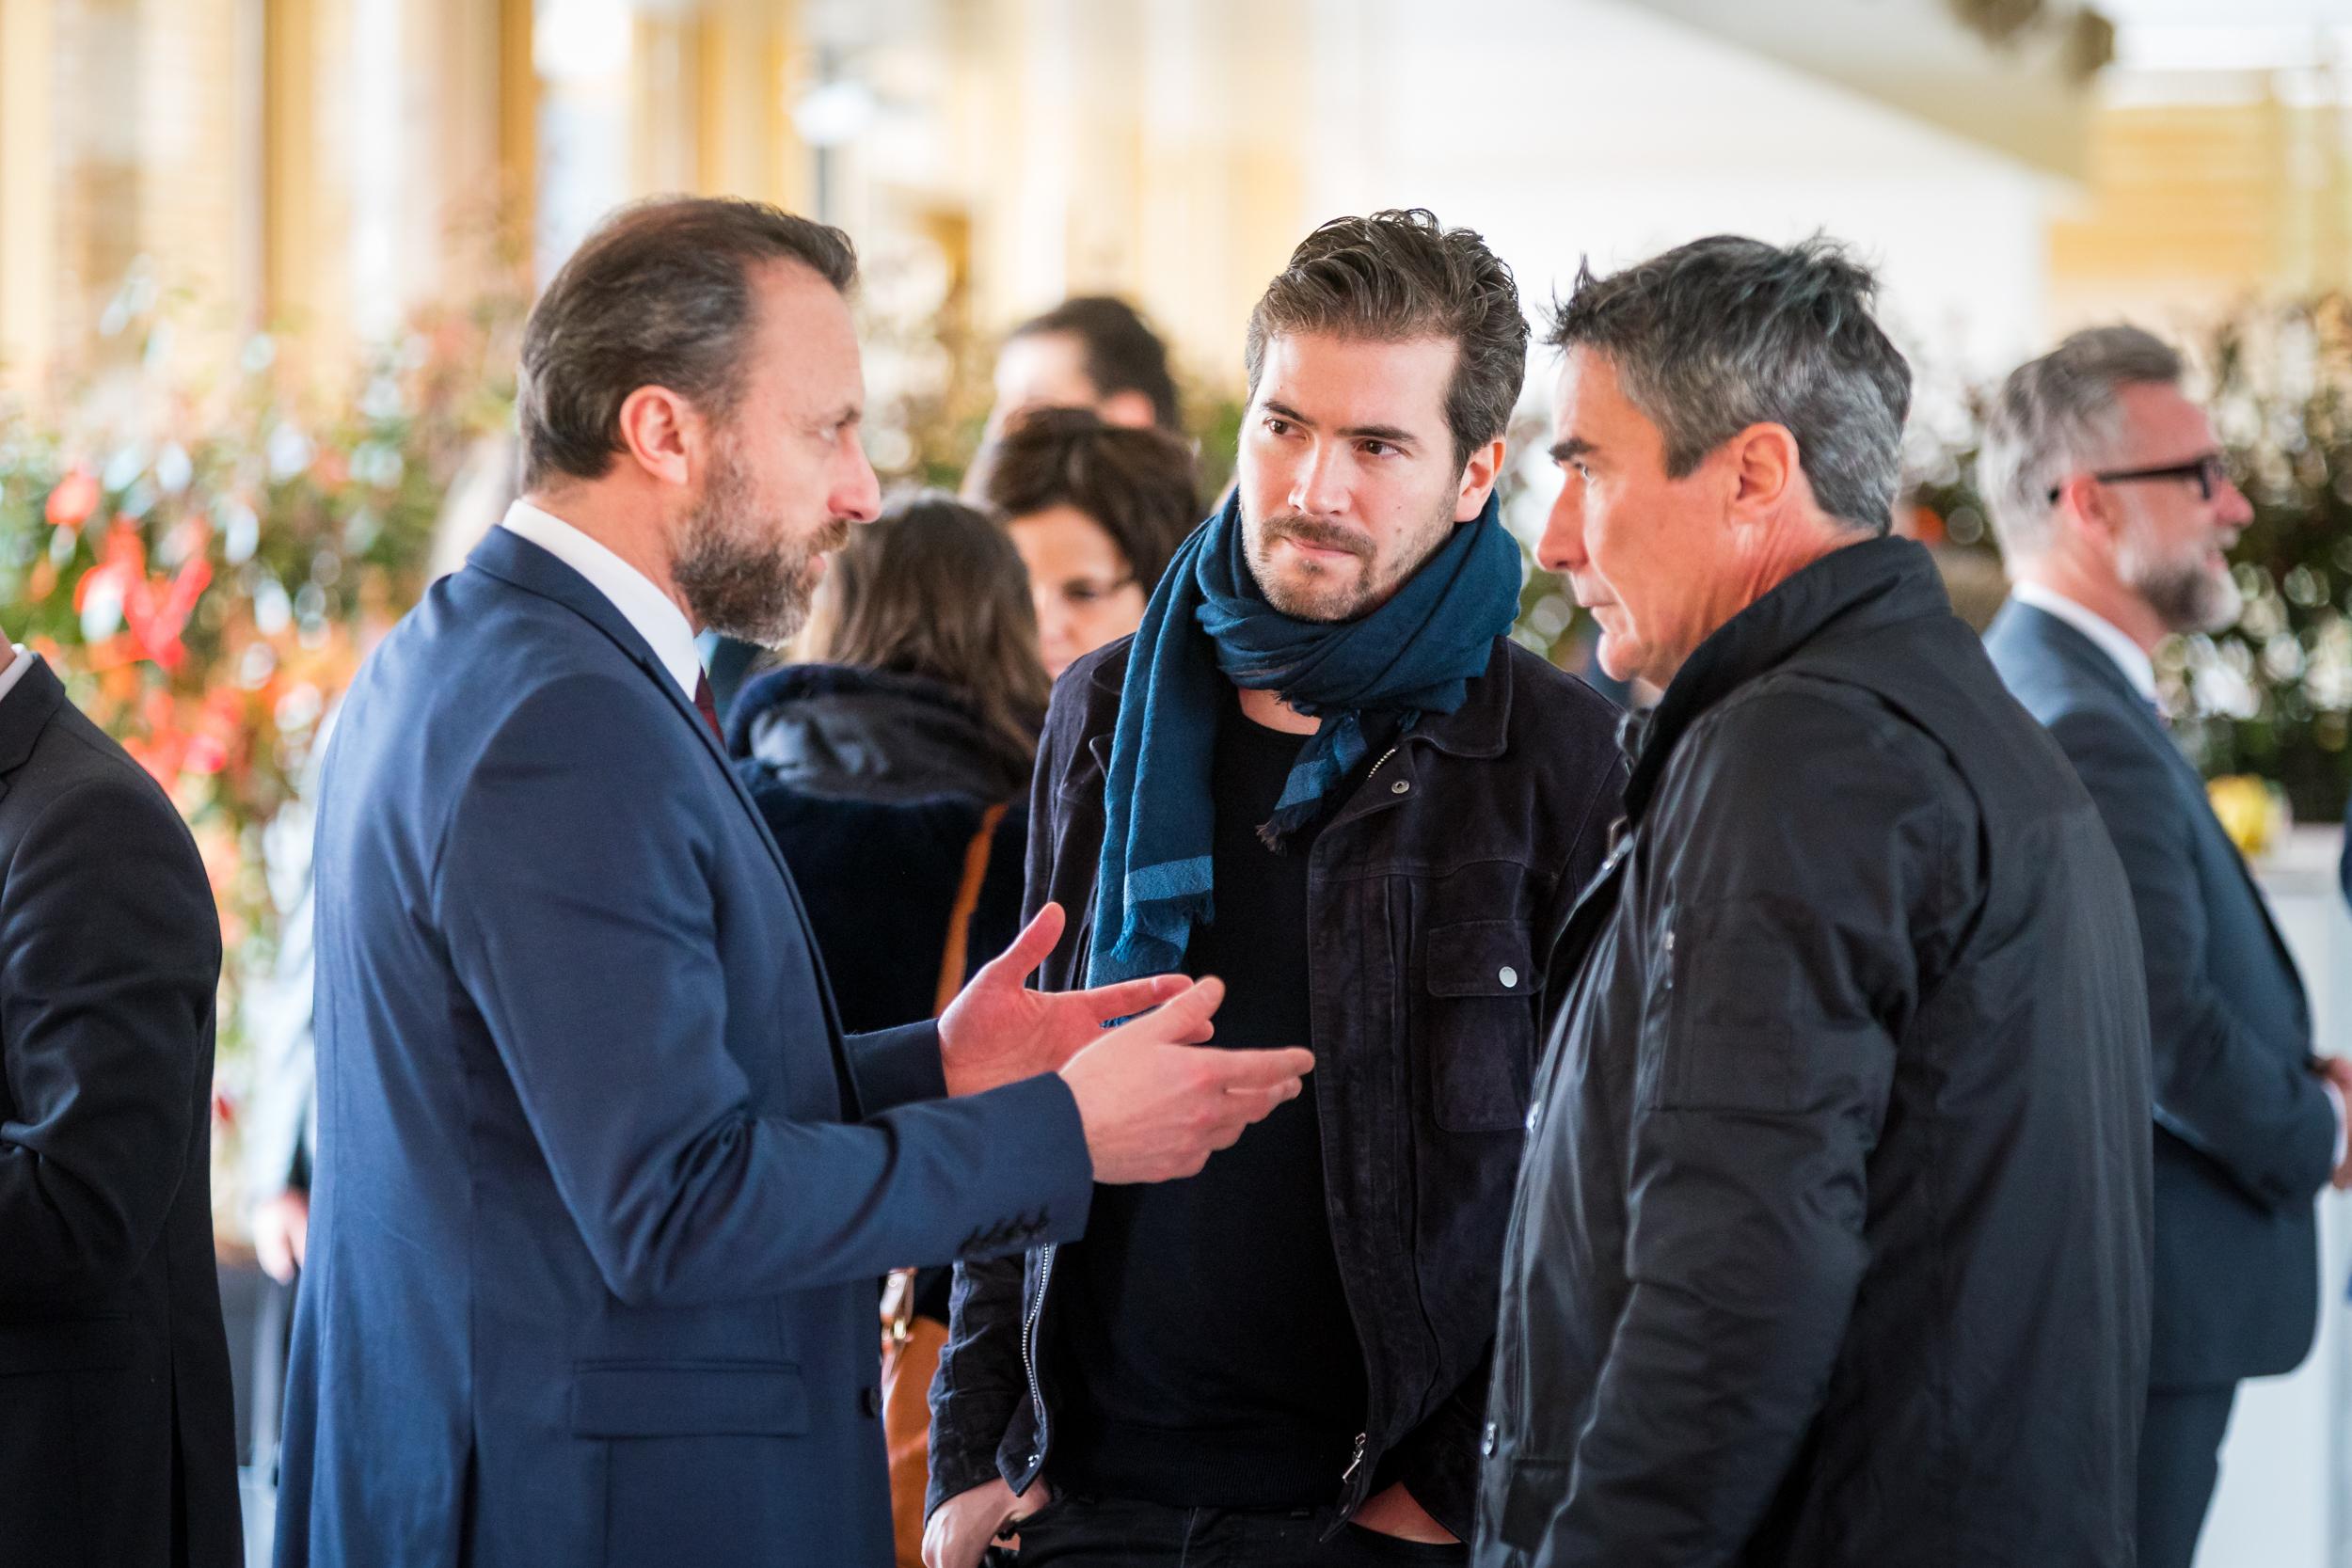 Conférence de Presse Longchamp 22-03-18 © Florian Léger- SHARE & DARE-8.jpg